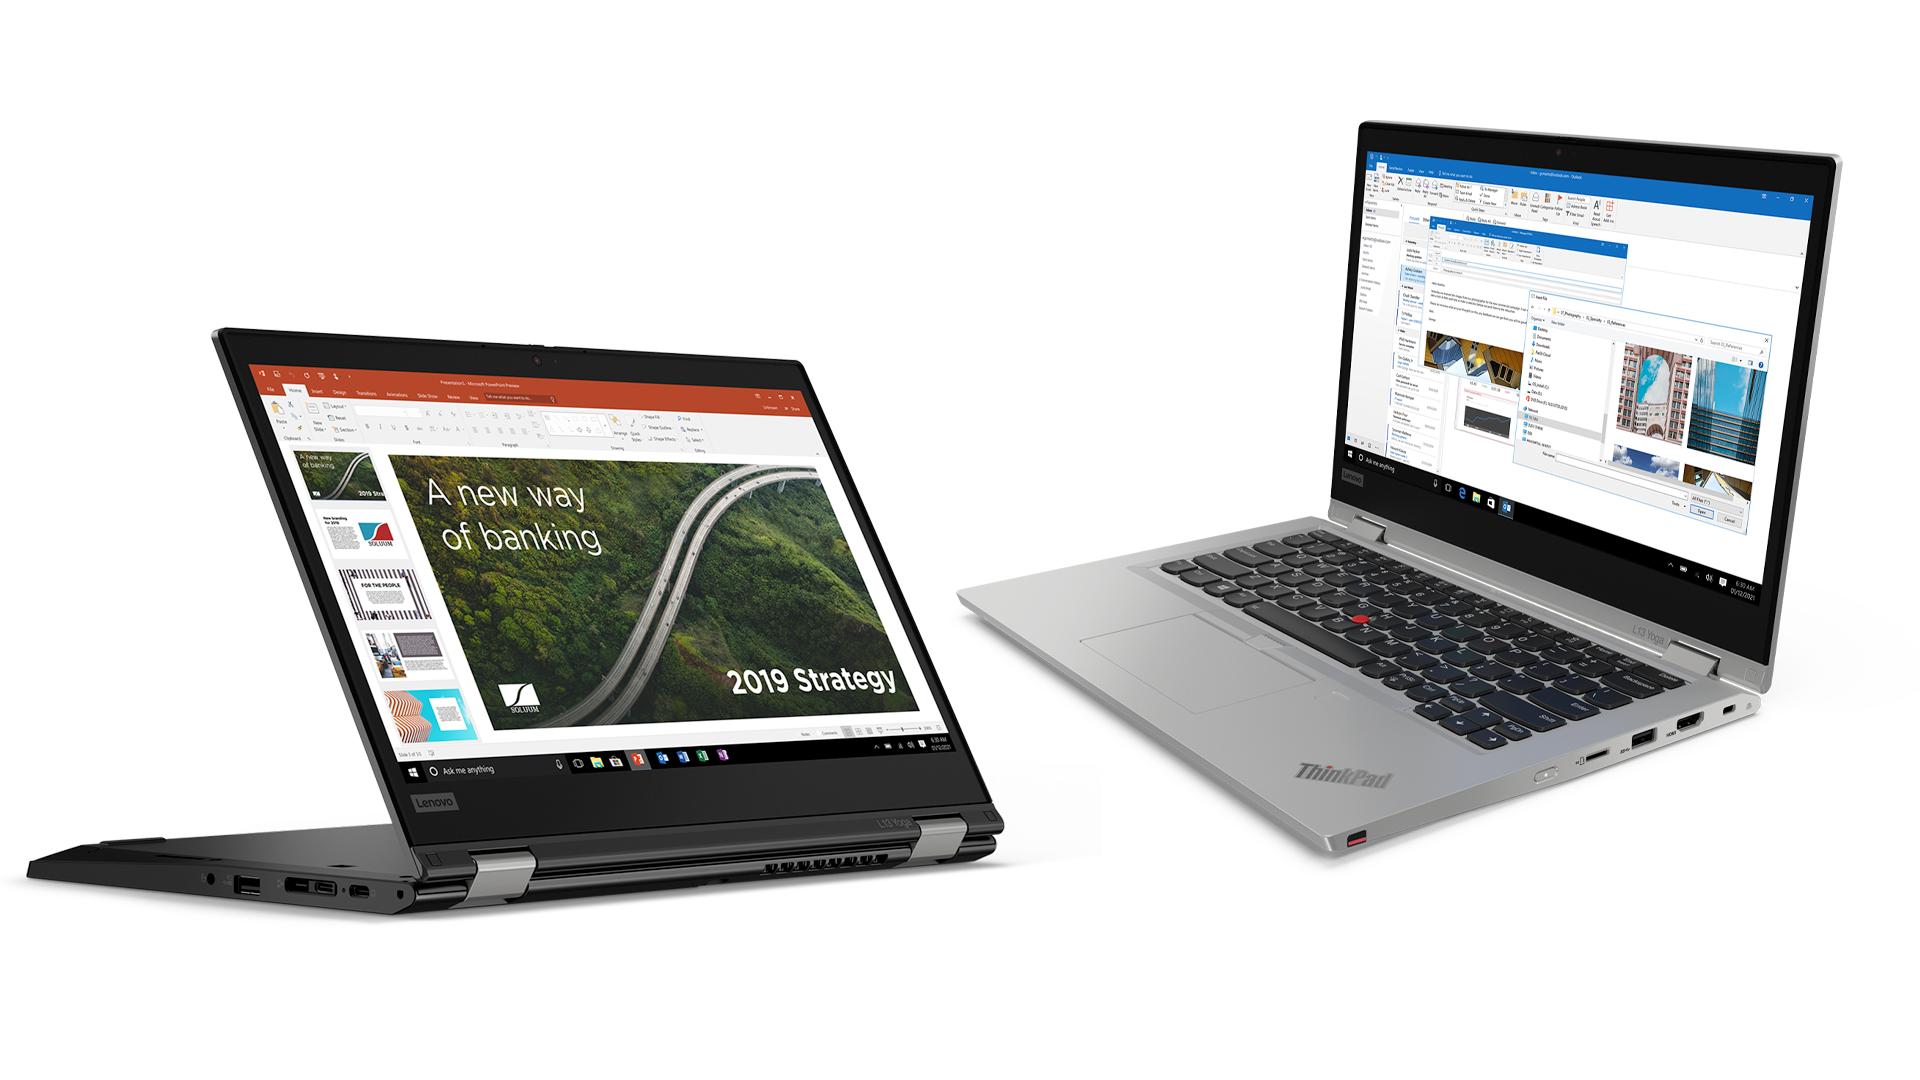 The Lenovo L13 and L13 Yoga